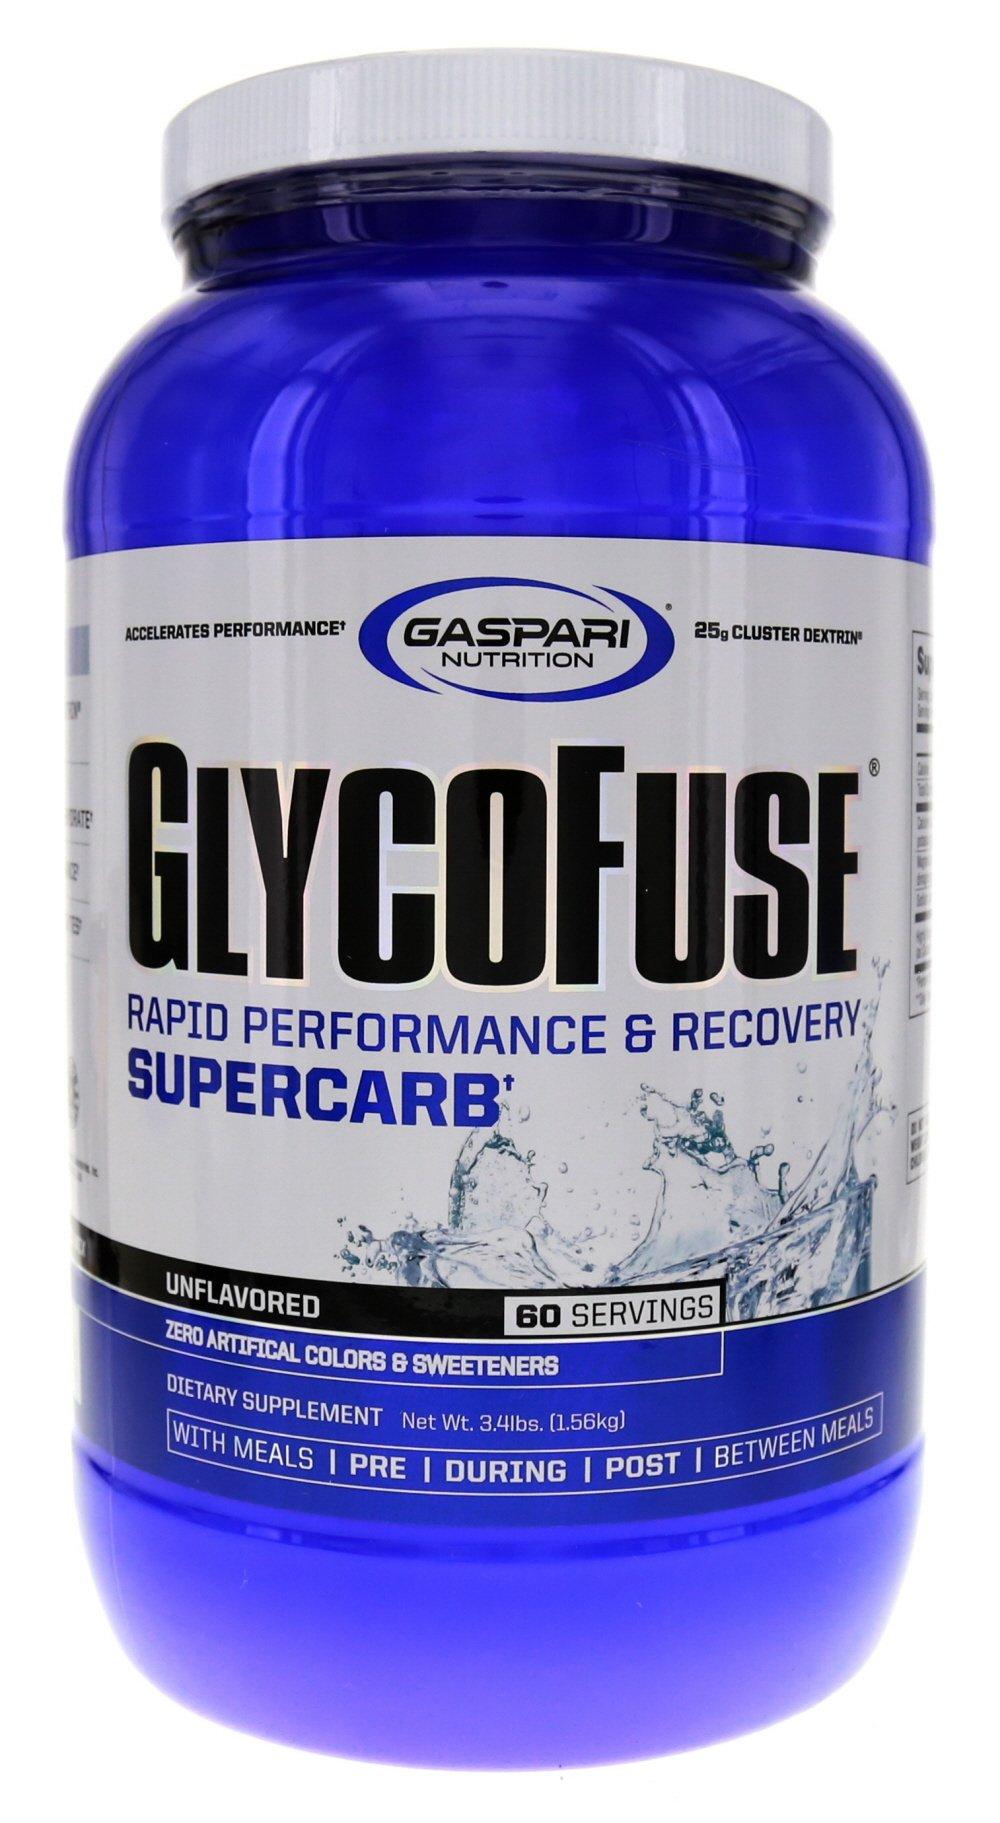 Gaspari Nutrition Glycofuse 1560g, Unflavored, 3.4 Pound